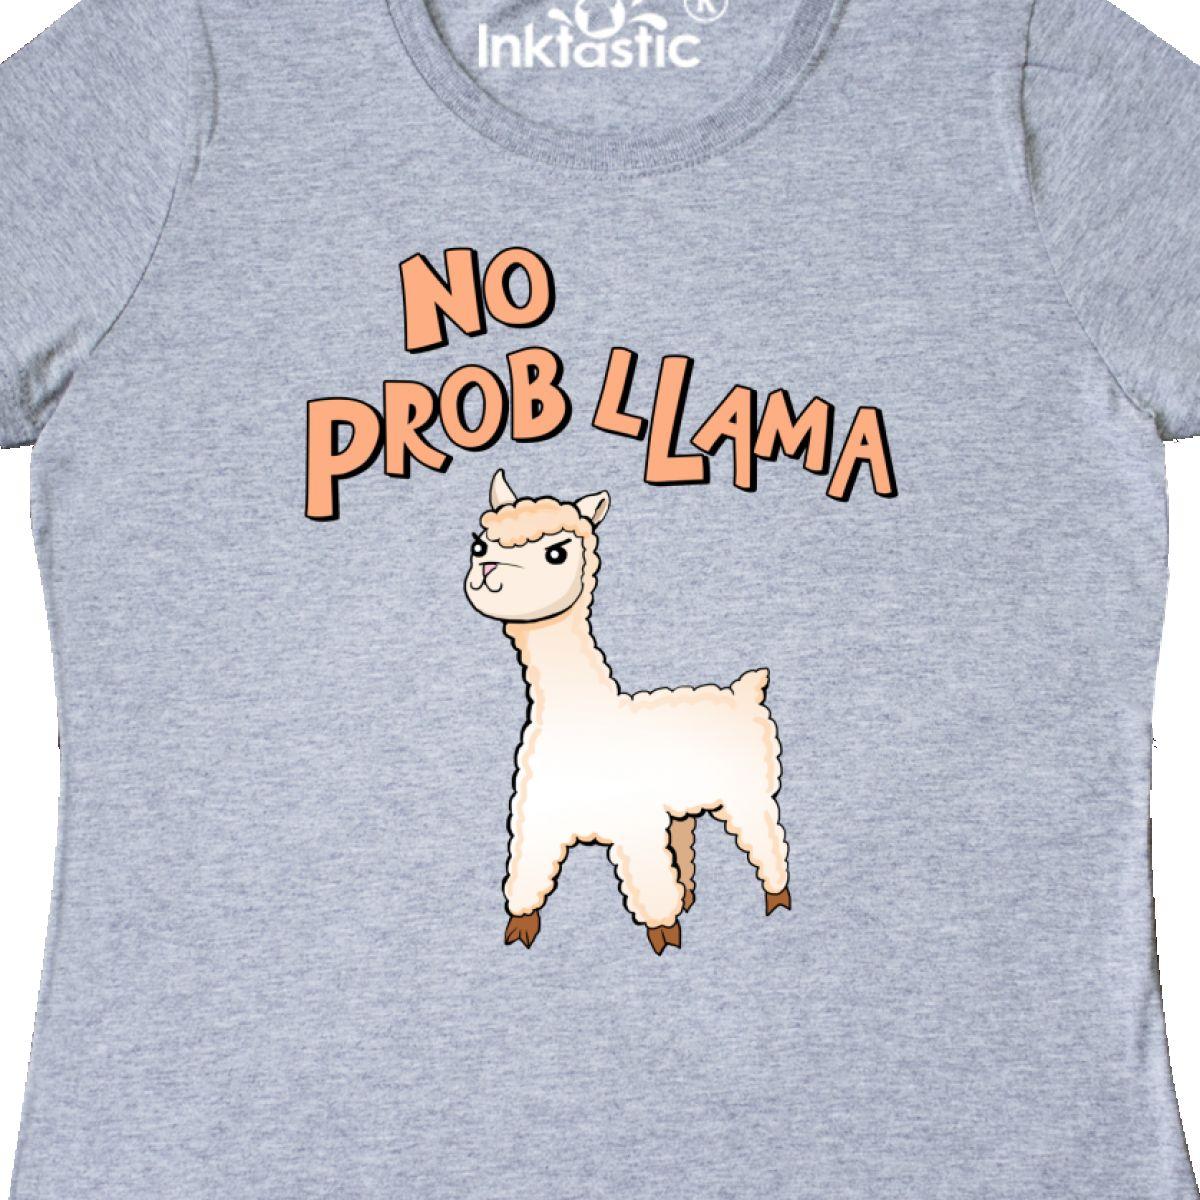 a8e838b662e Details about Inktastic No Prob Llama Cute Llama Women s T-Shirt Animals  Determined Wool Ears